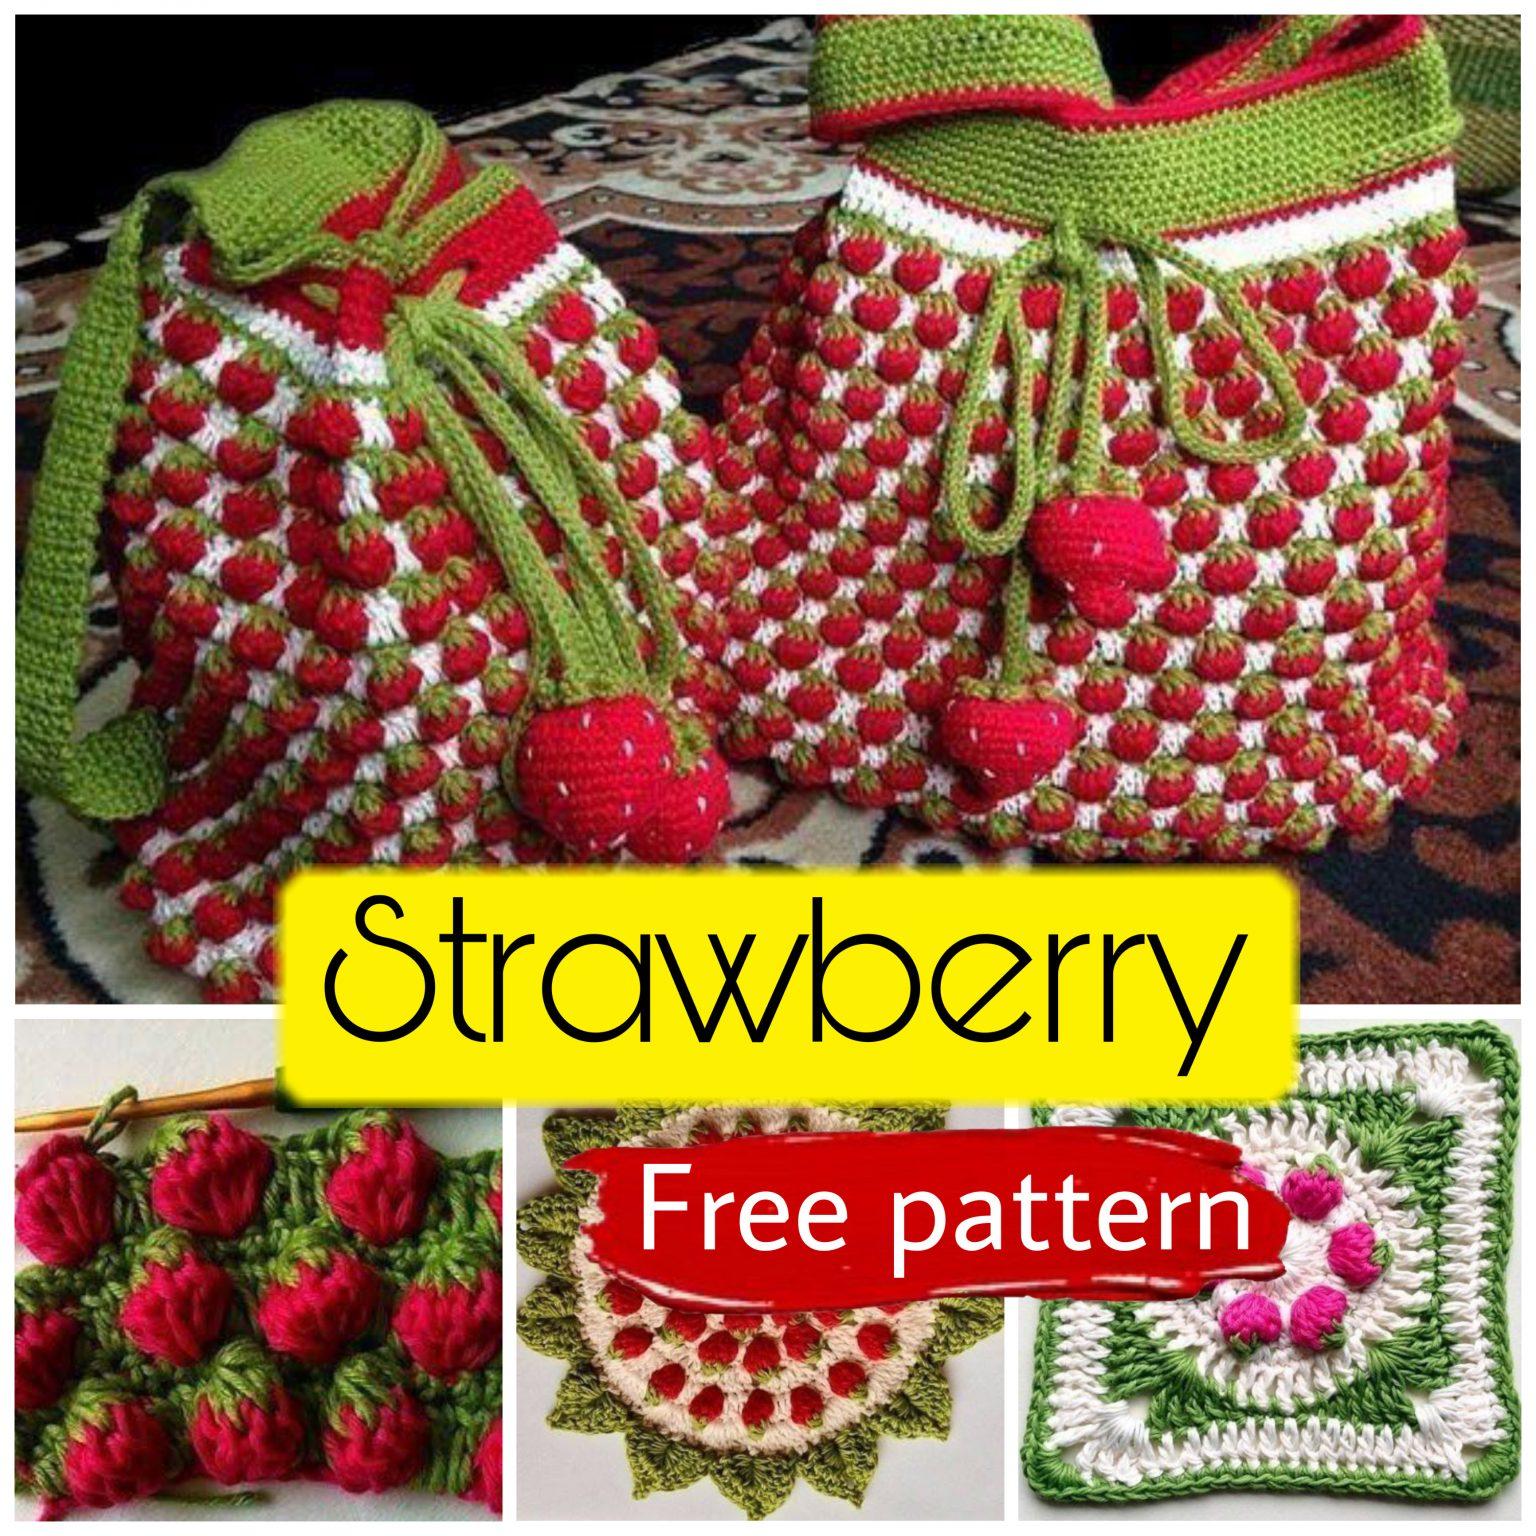 Free crochet pattern like strawberry